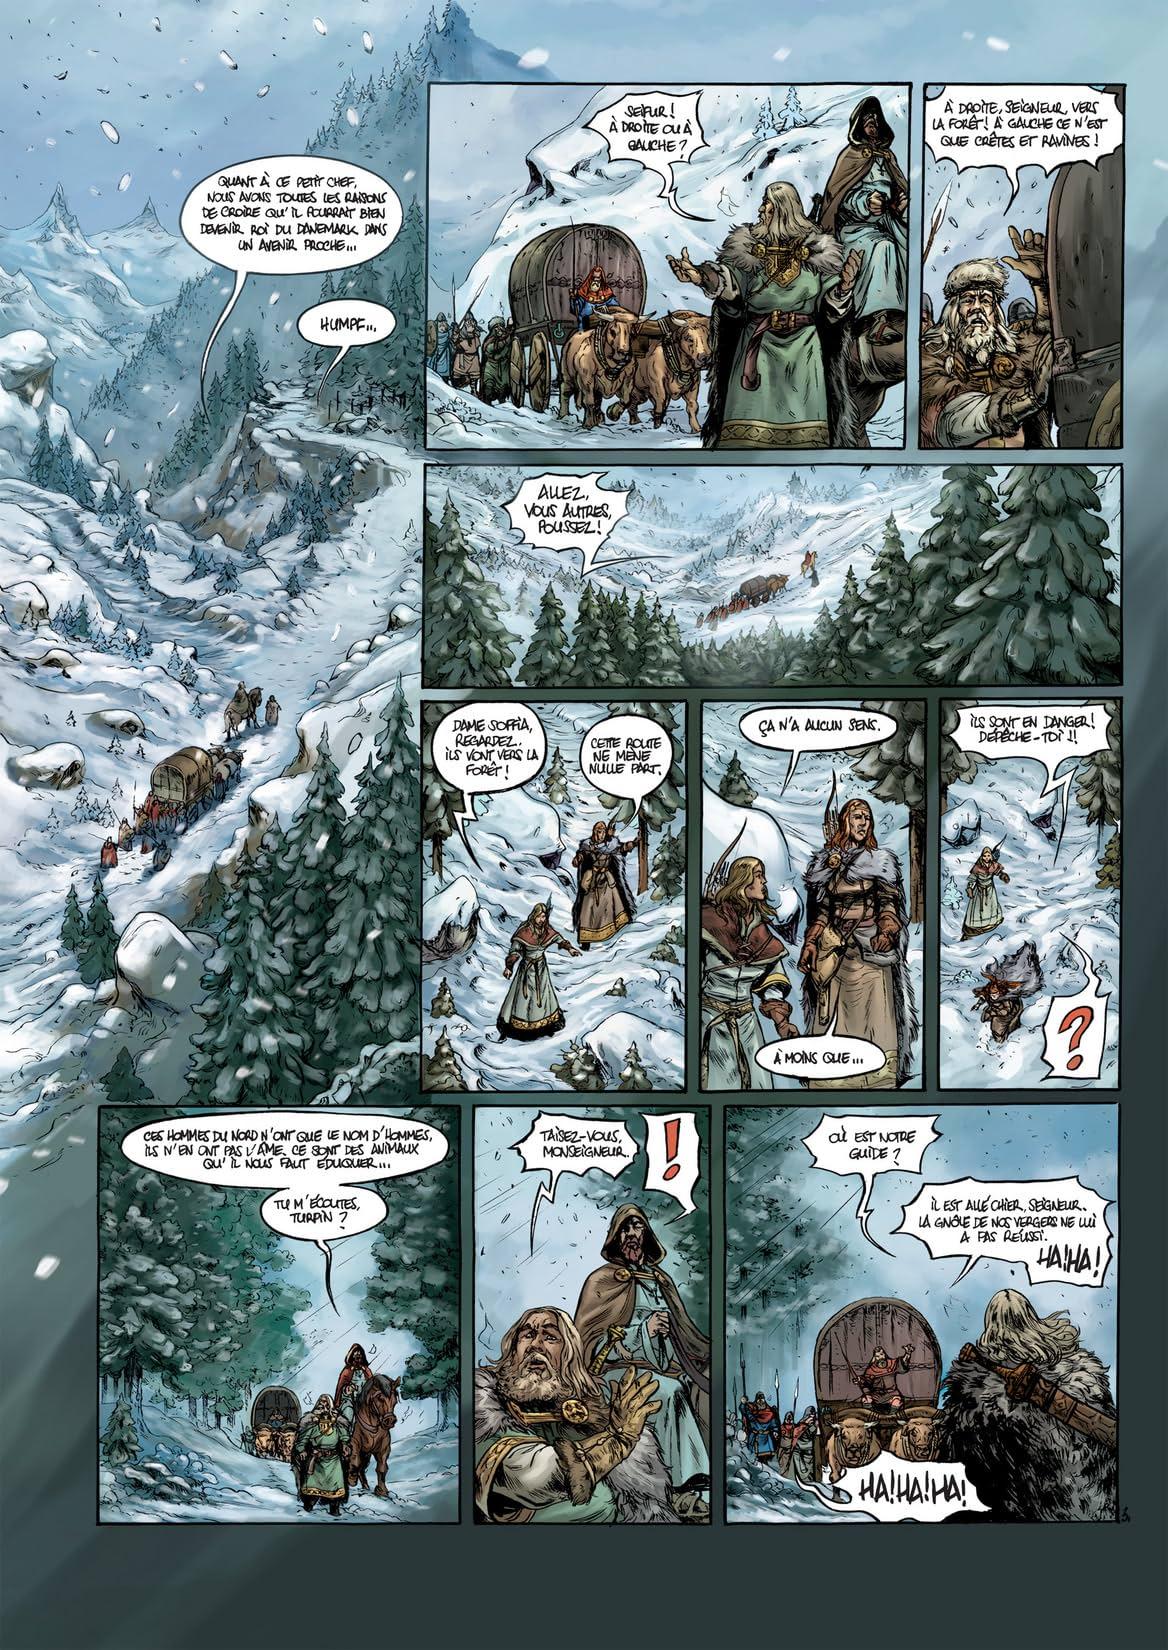 Durandal Tome 2: La marche de Bretagne partie II